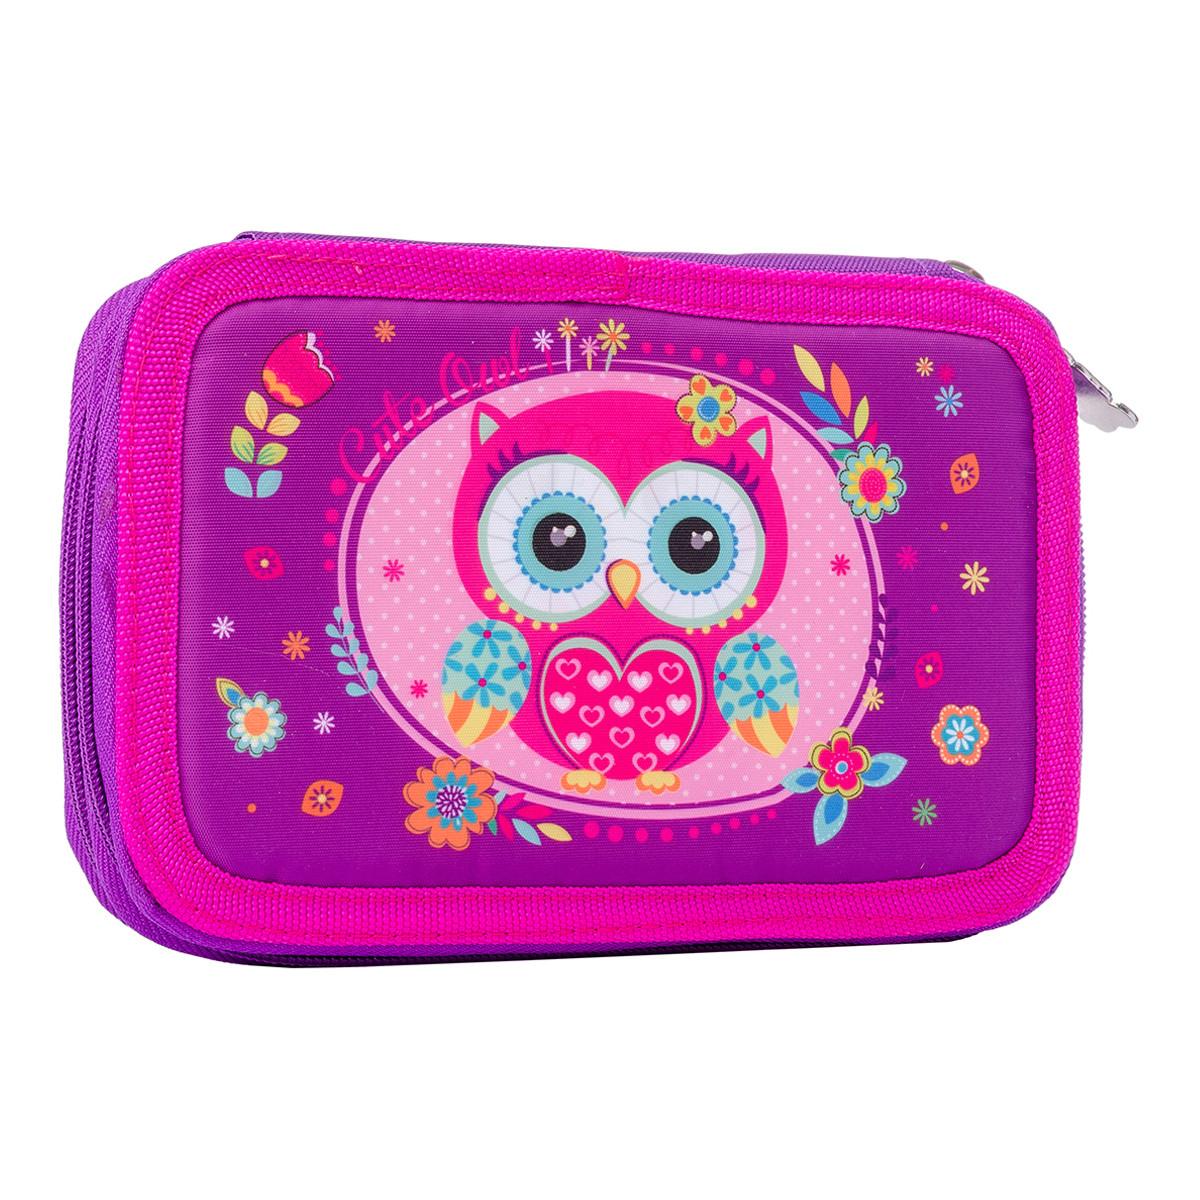 "Пенал твердый двойной HP-01 ""Little Owl"" код:532725"